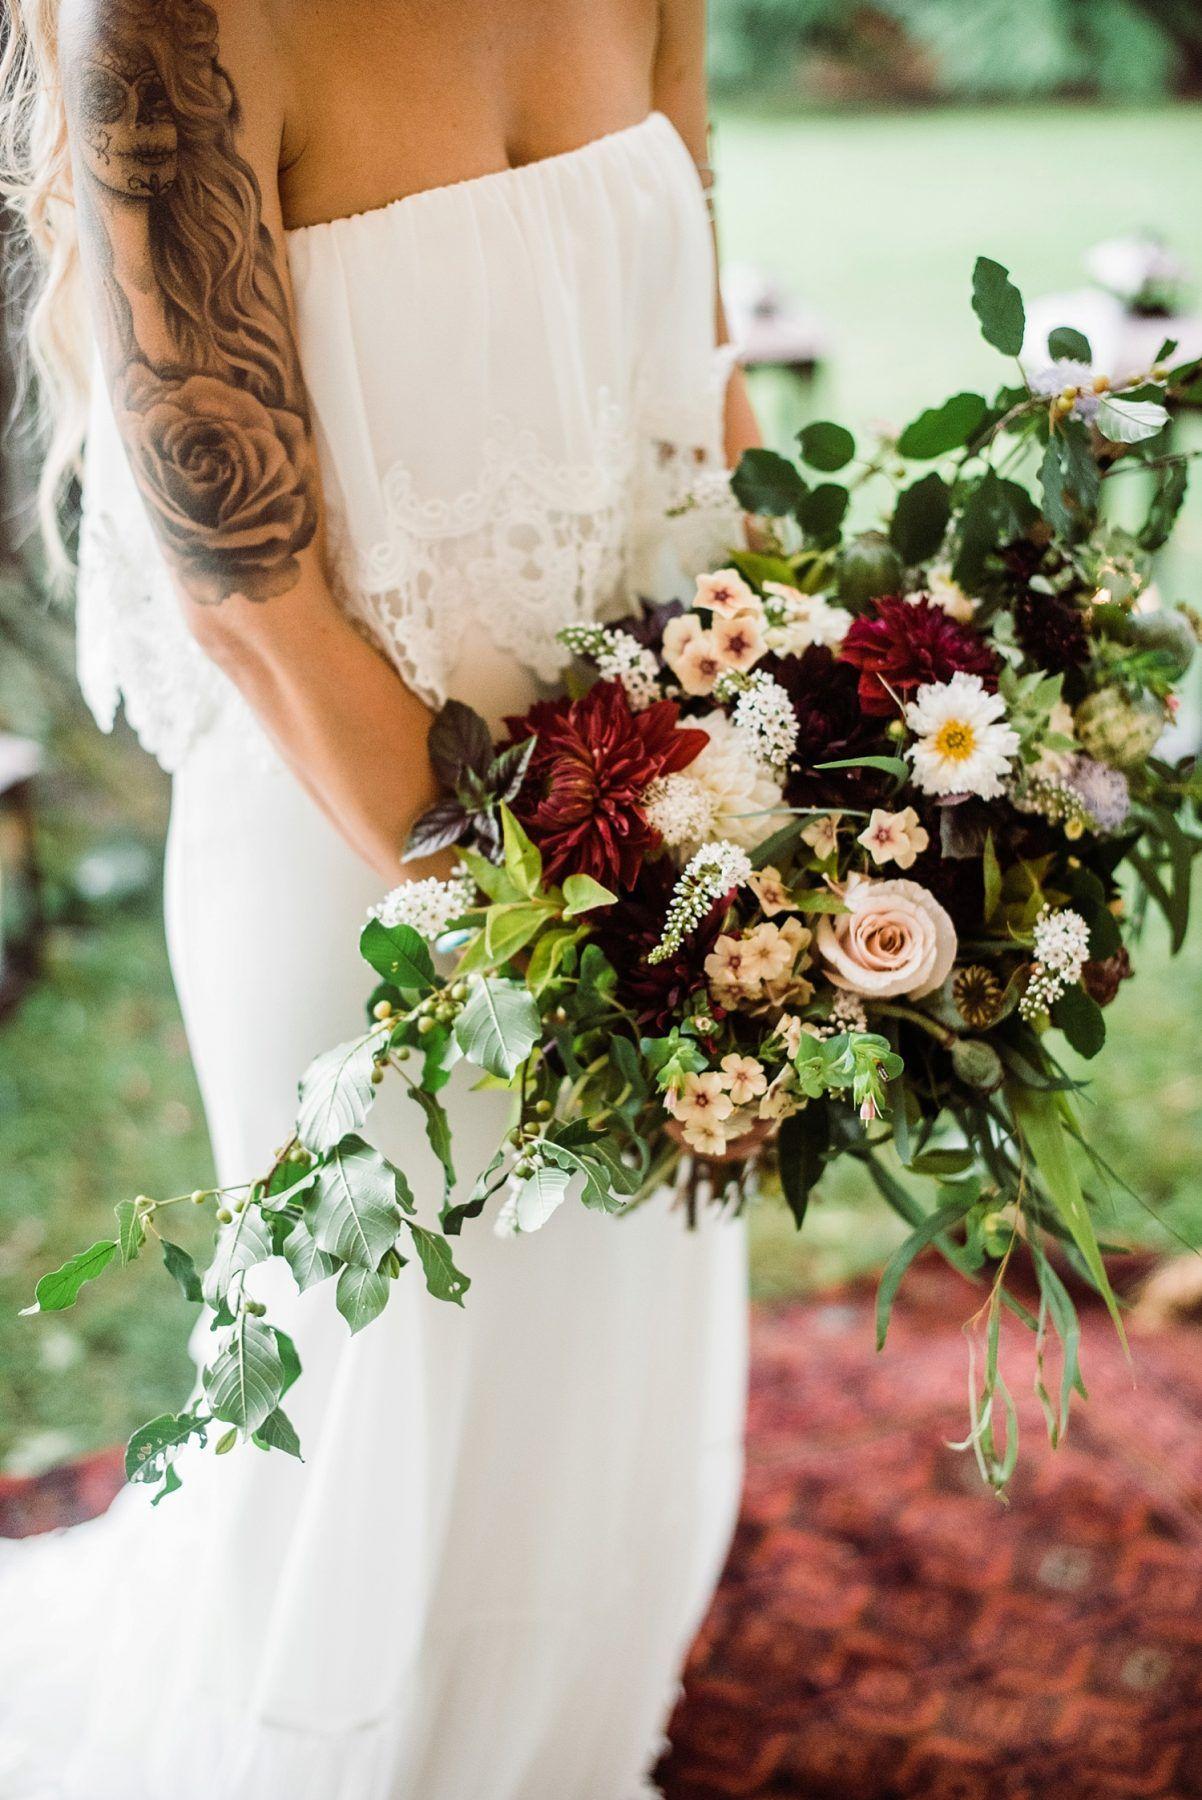 2019 S Most Beautiful Pittsburgh Wedding Dresses Wedding Dresses Pittsburgh Weddings Stephen Yearick Wedding Dresses